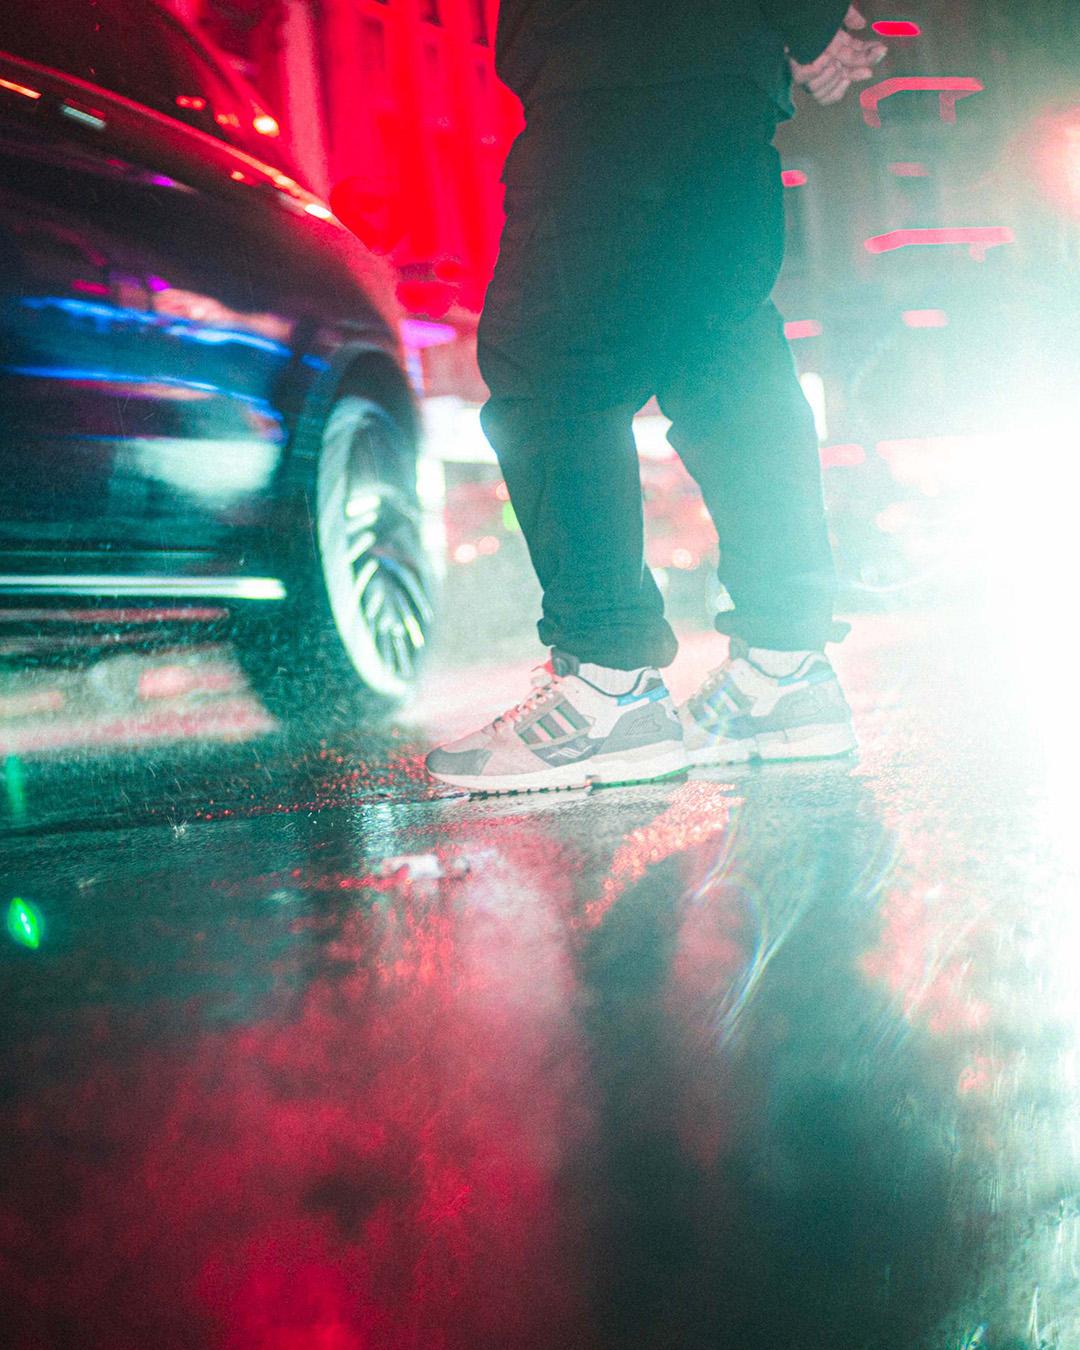 "on feet - adidas x 43einhalb - ZX10000- ""Joint Path"" - cbrown/owhite/clback - GY5108"